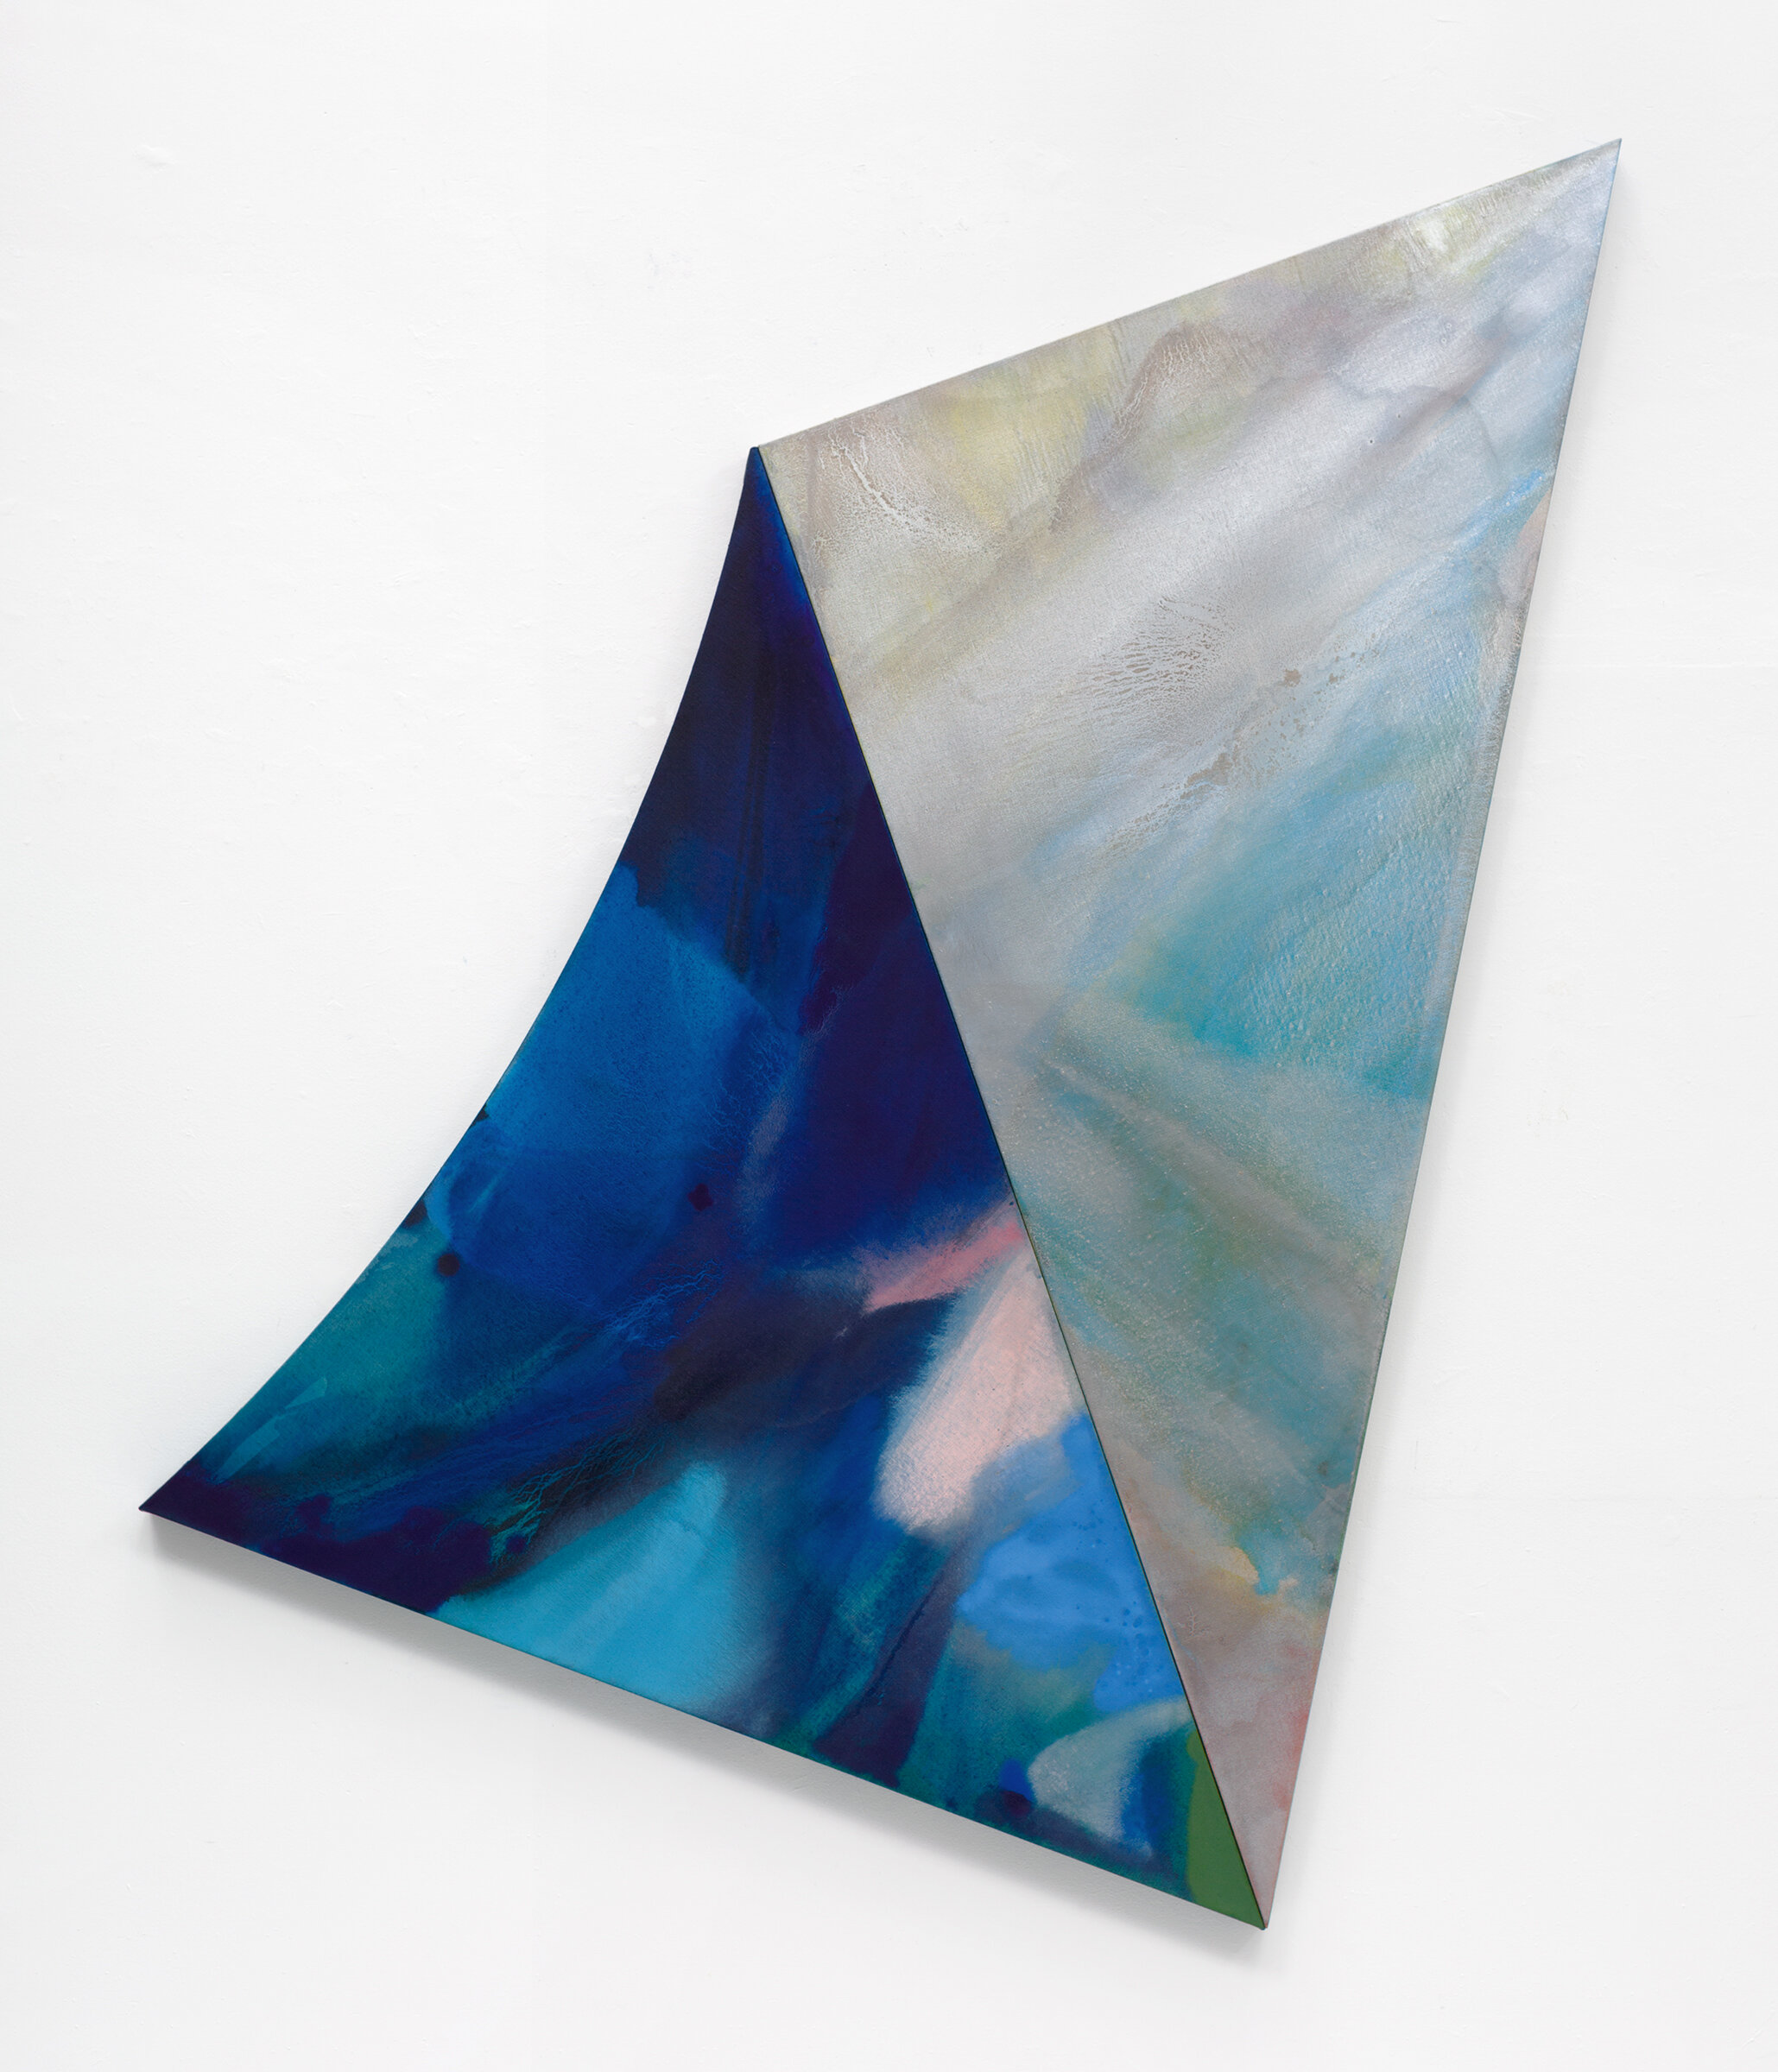 "PAMELA JORDEN  Silver Point , 2019 oil and acrylic on linen, 74"" x 61.25"""